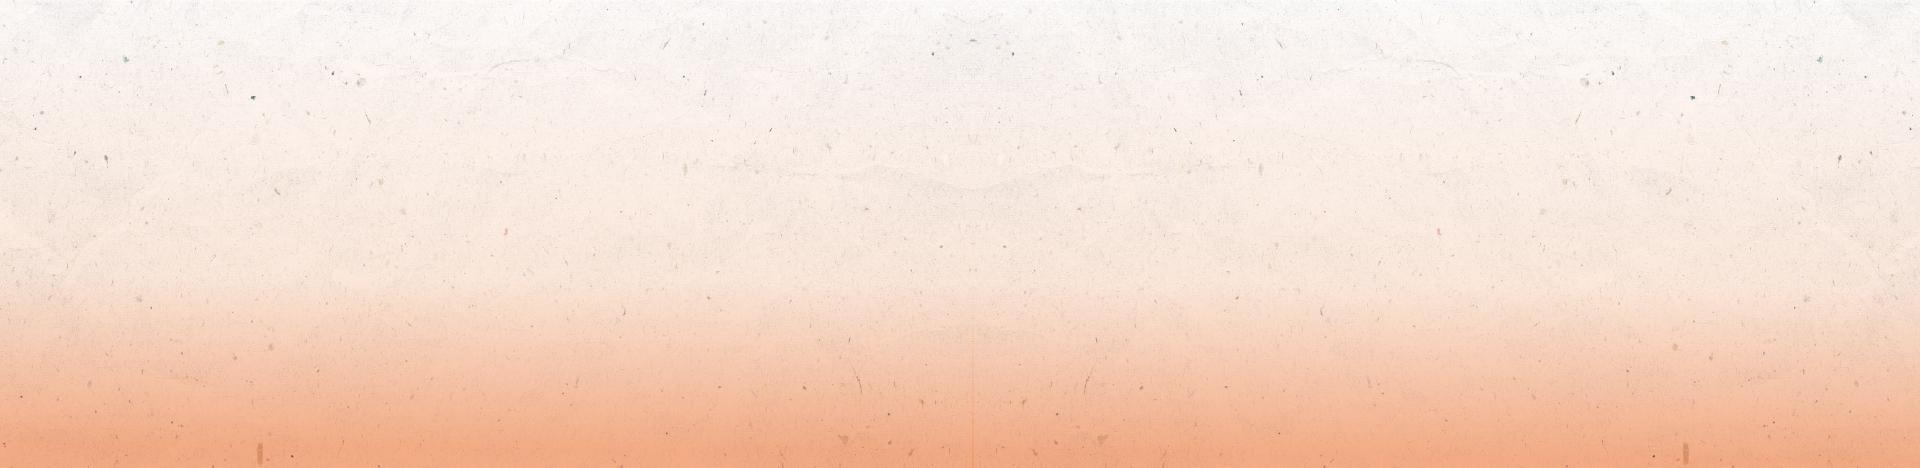 banner_web2-03